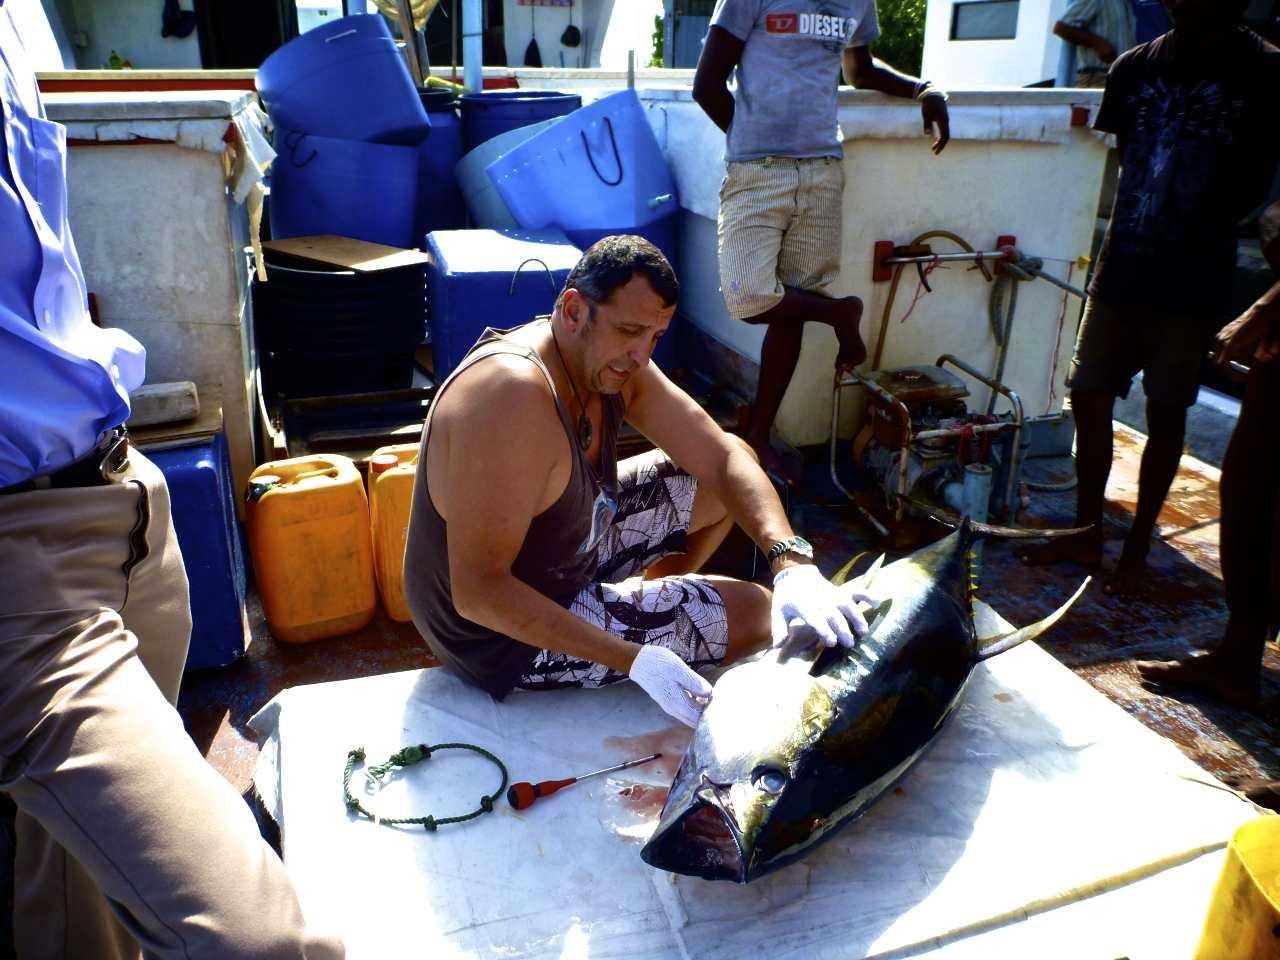 NGOs slam fishing nation delay tactics: stalemate on albacore tuna